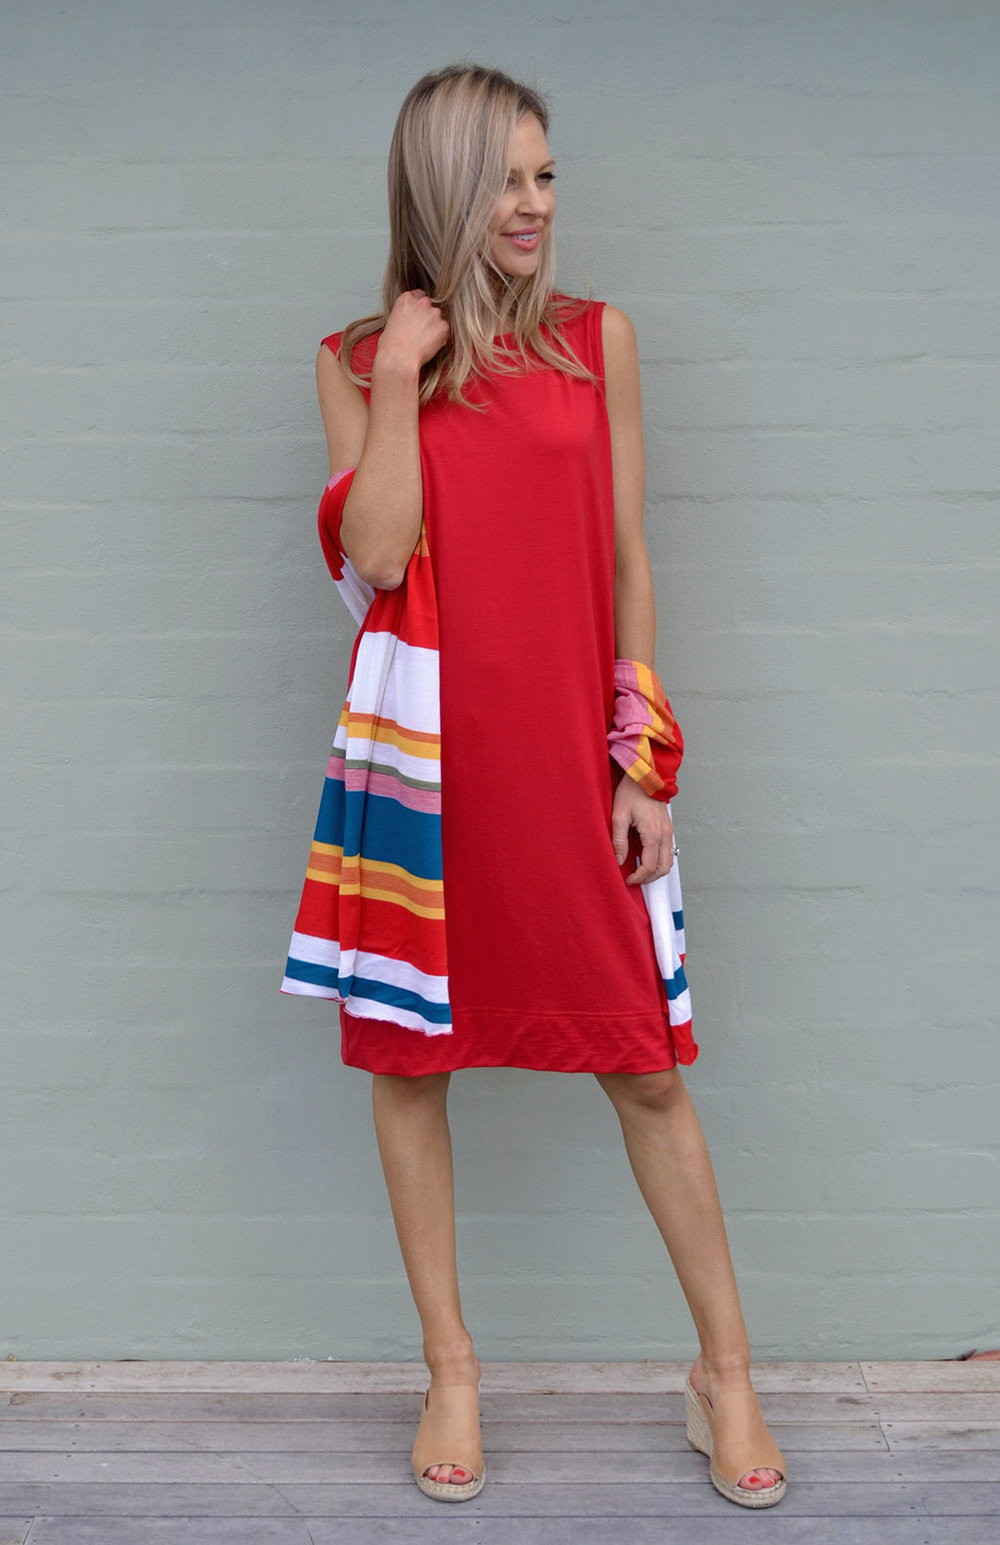 8586-holly-sleeveless-audrey-dress-flame-red-01-studio.jpg